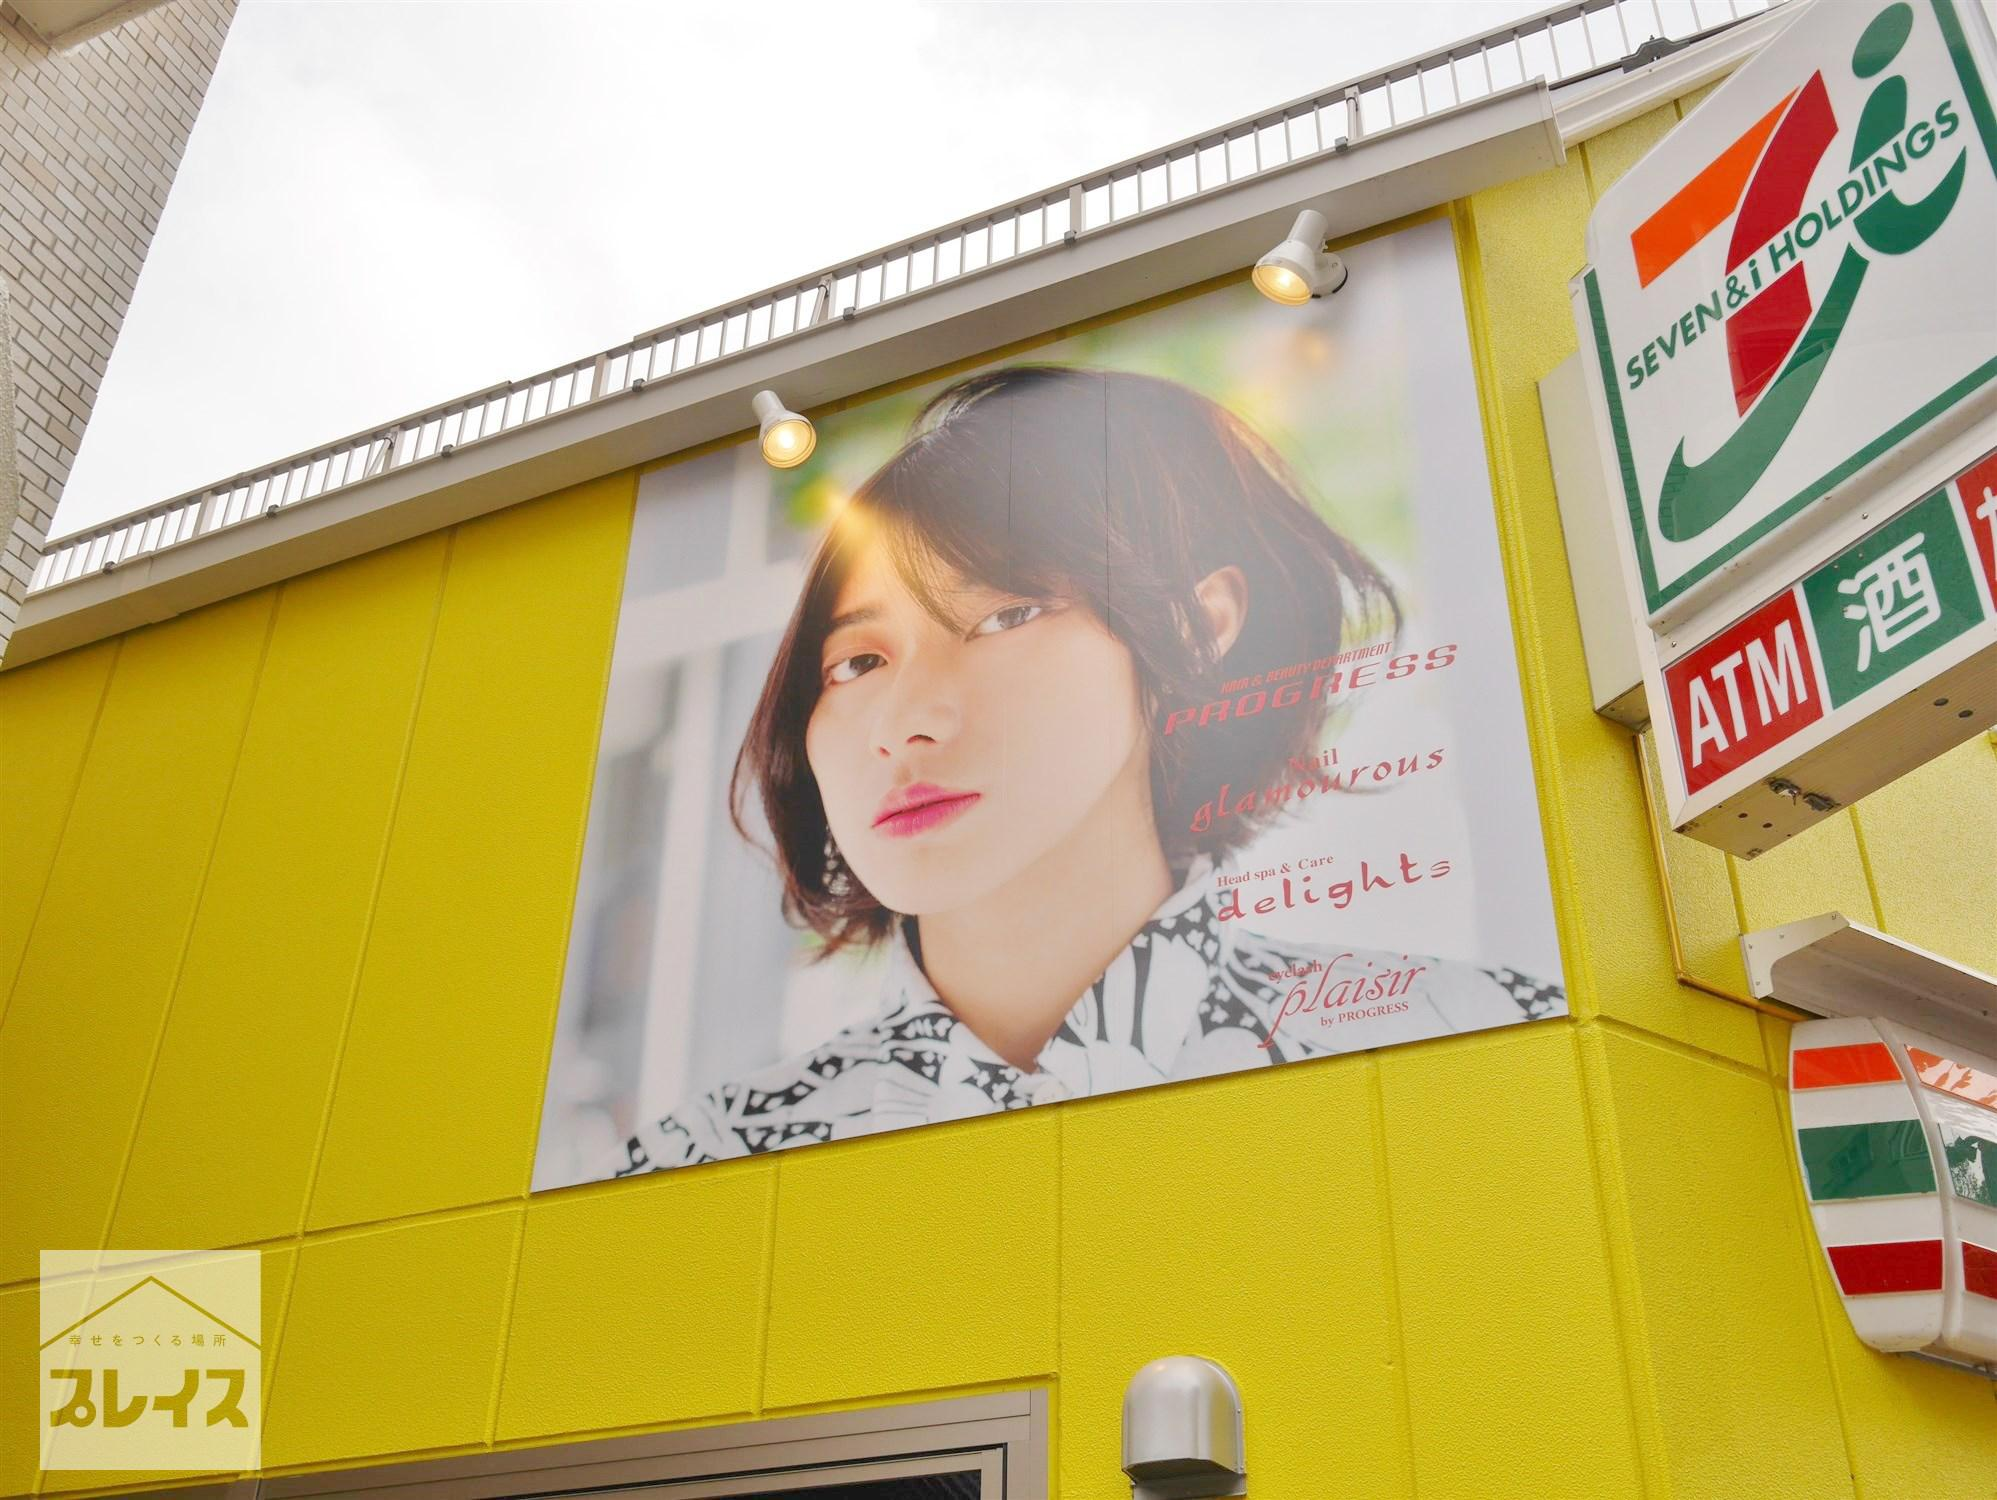 LA20181112-武蔵野市-御殿山1丁目/PROGRESS吉祥寺店 (8).jpg